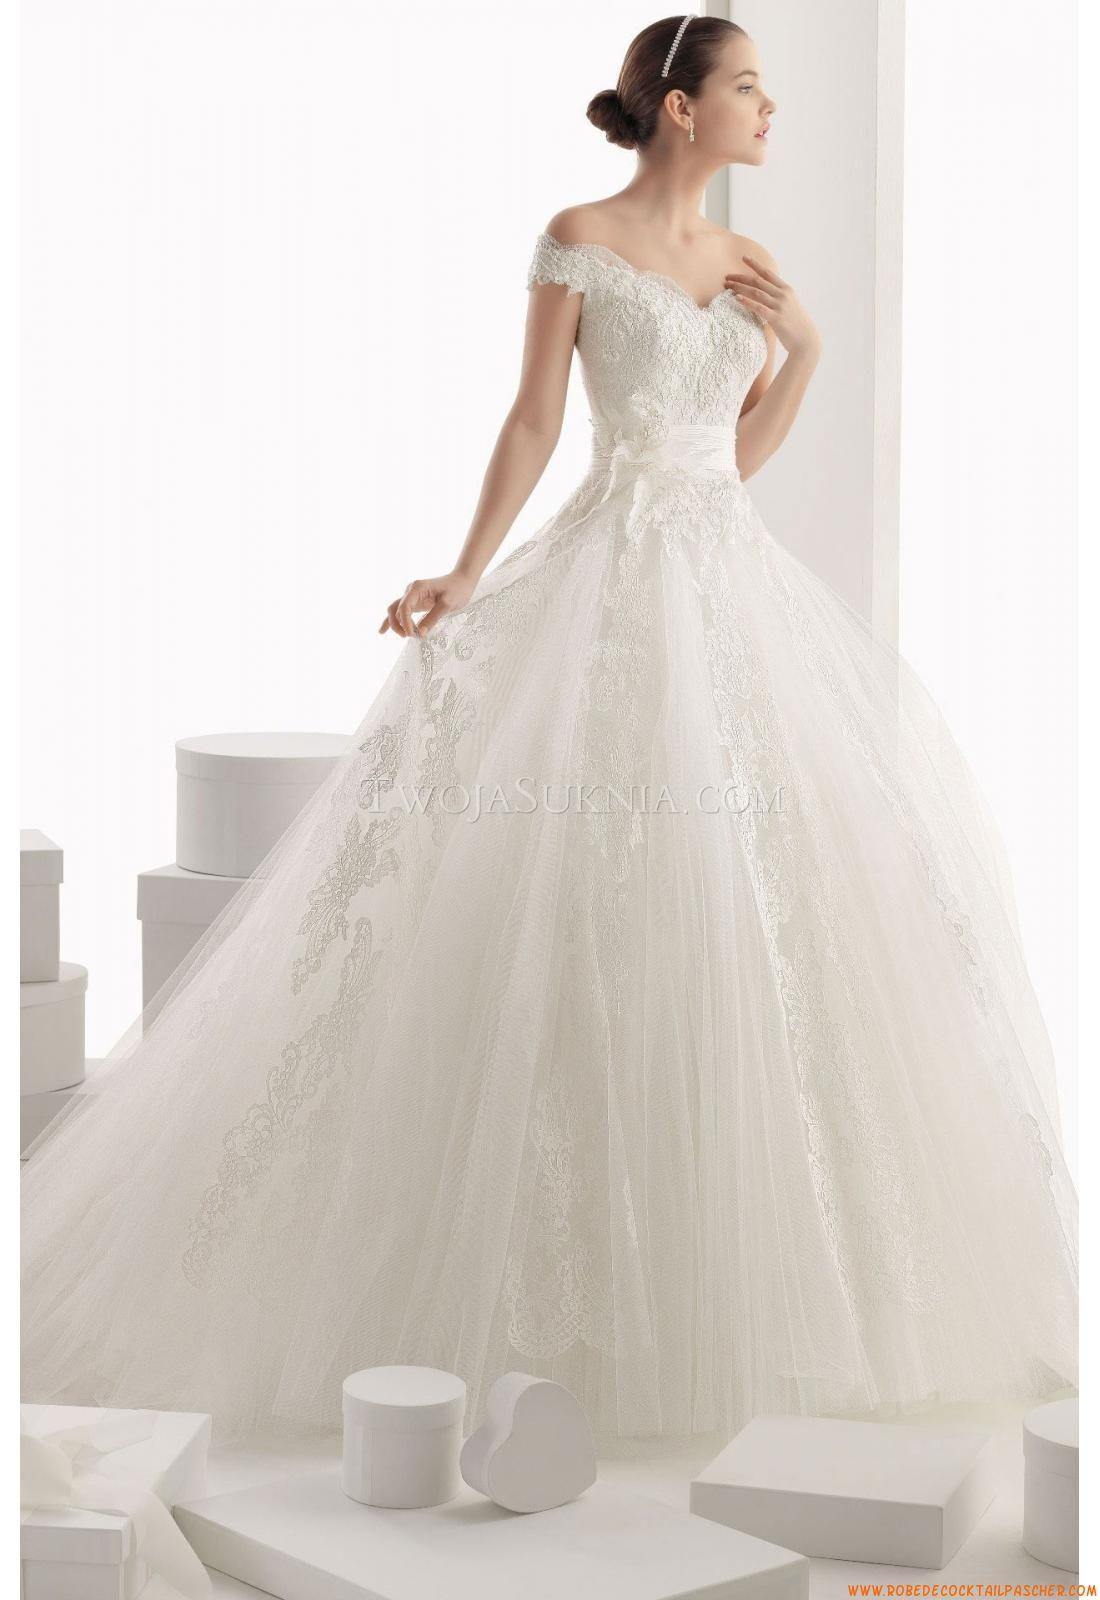 Robe de marie rosa clara carmina out door bridal gowns